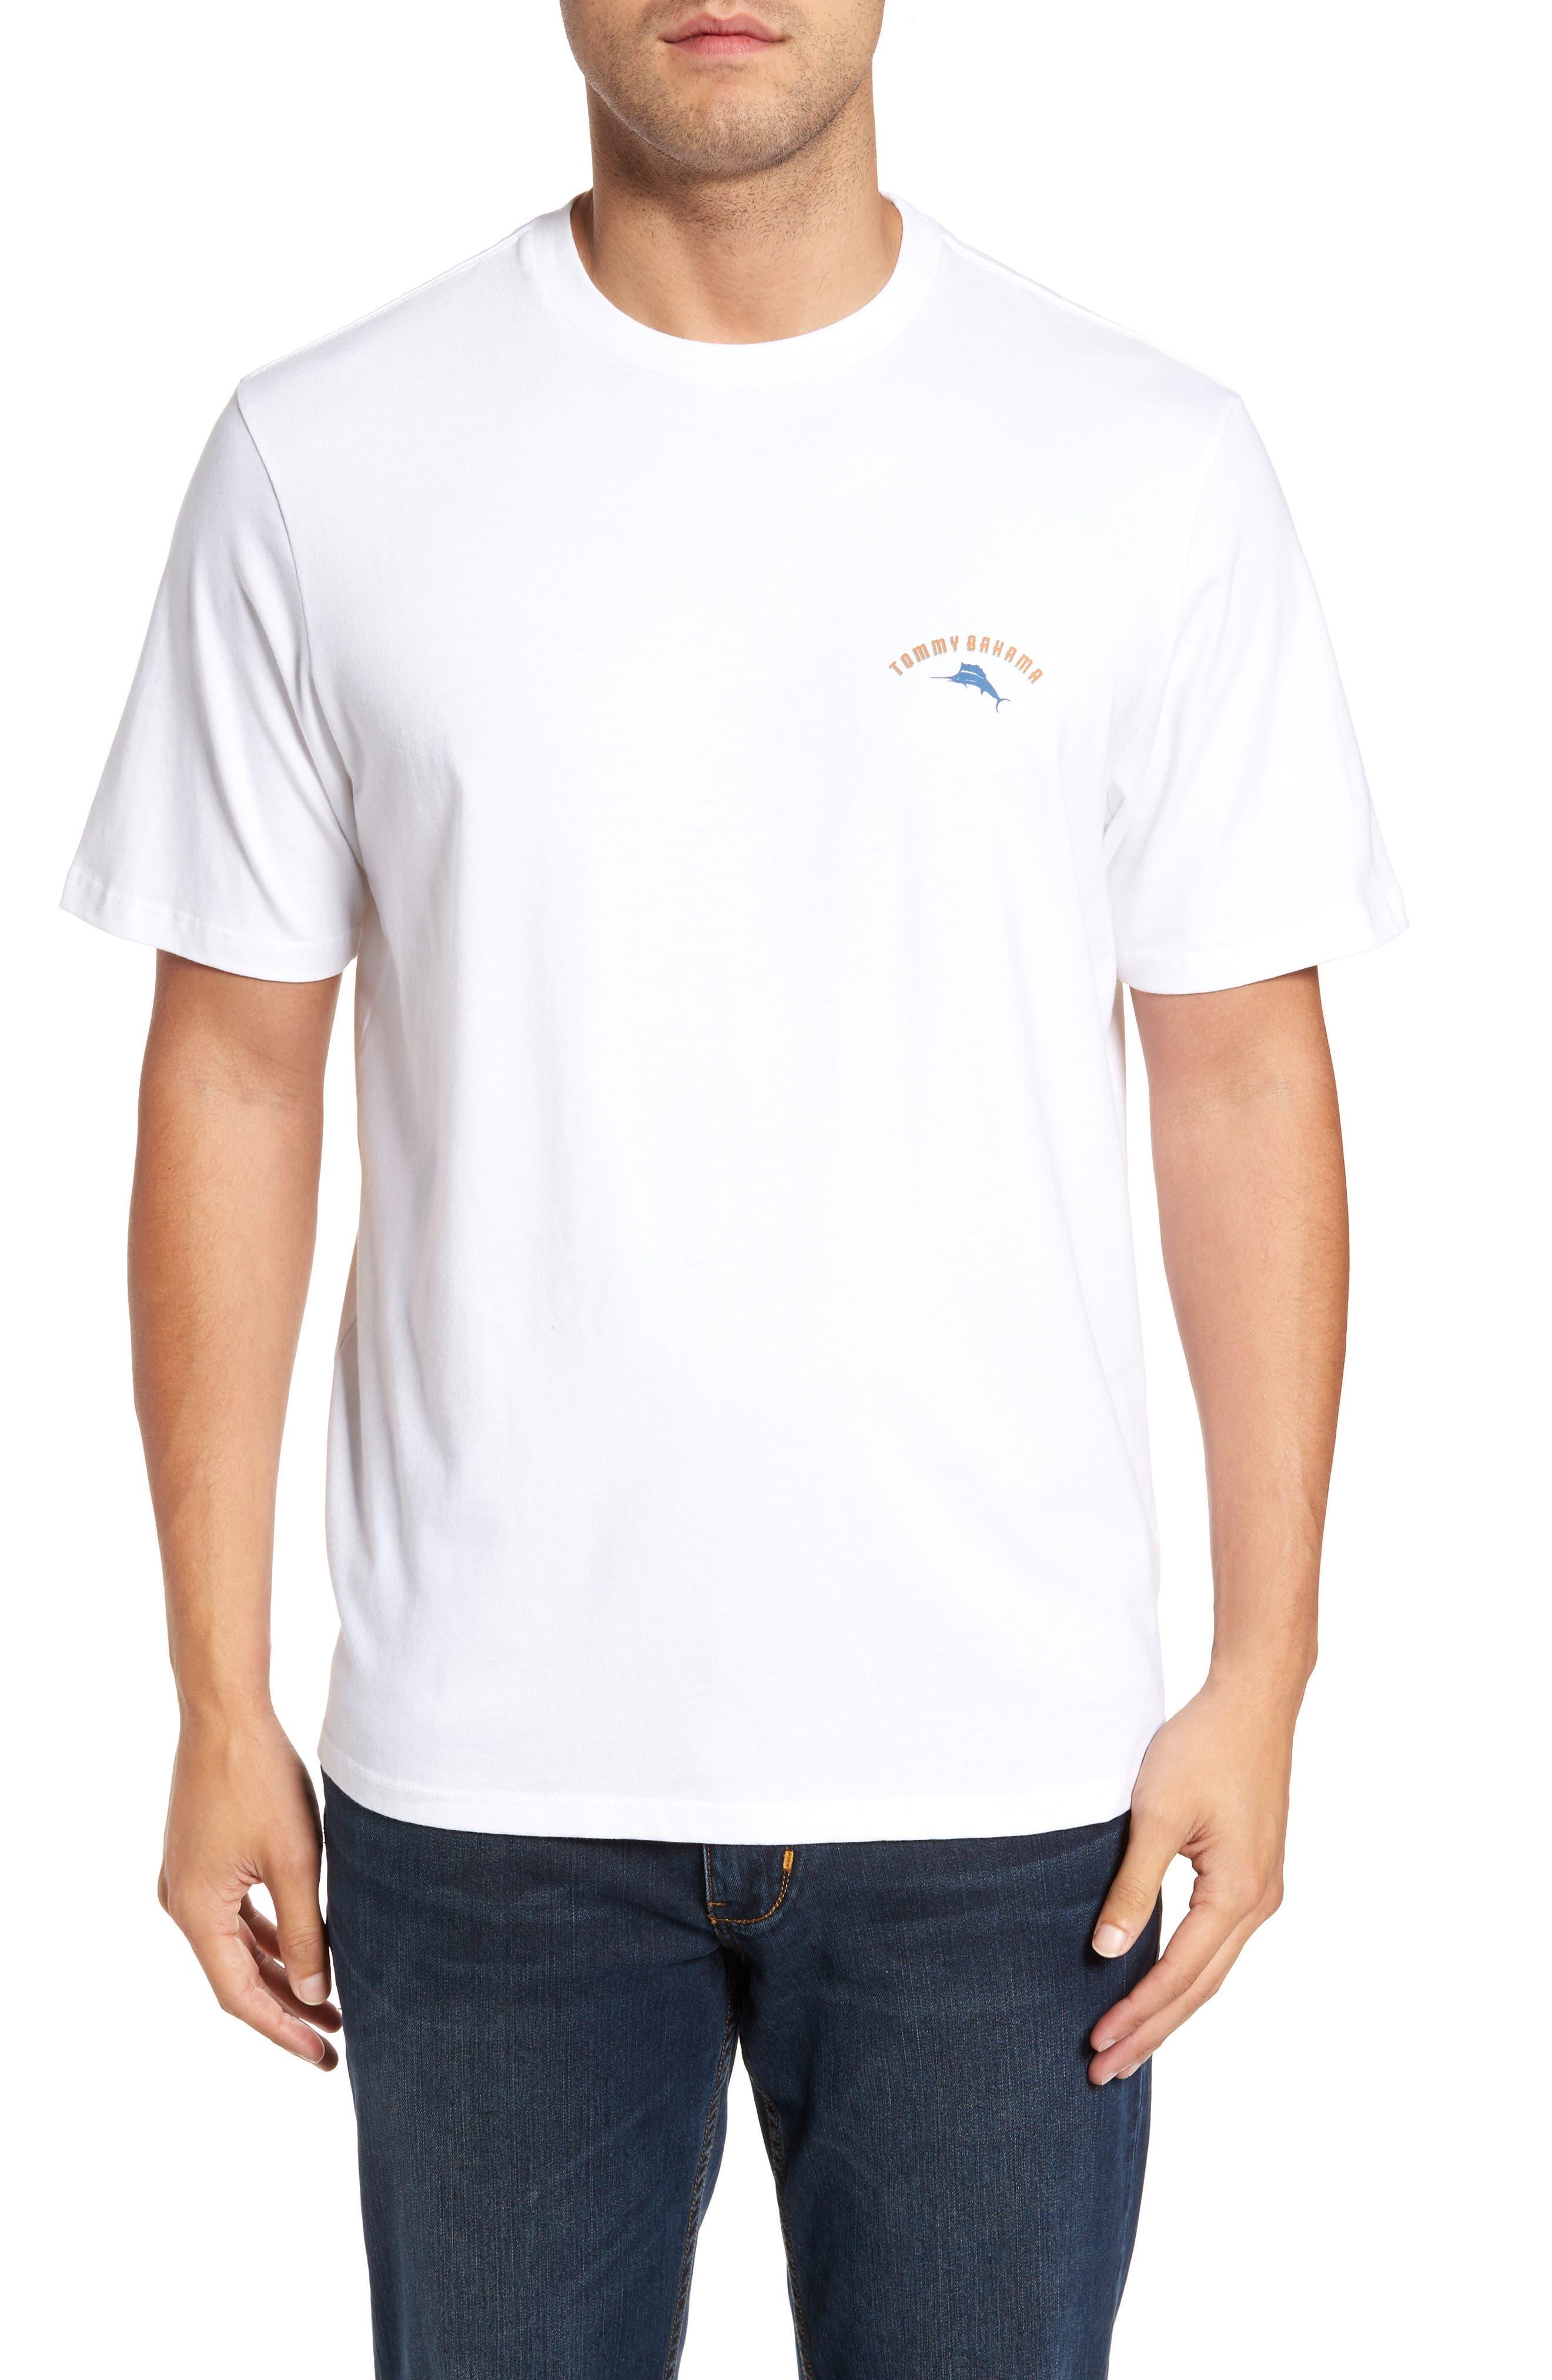 Three Cans Graphic T-Shirt,                             Main thumbnail 1, color,                             100